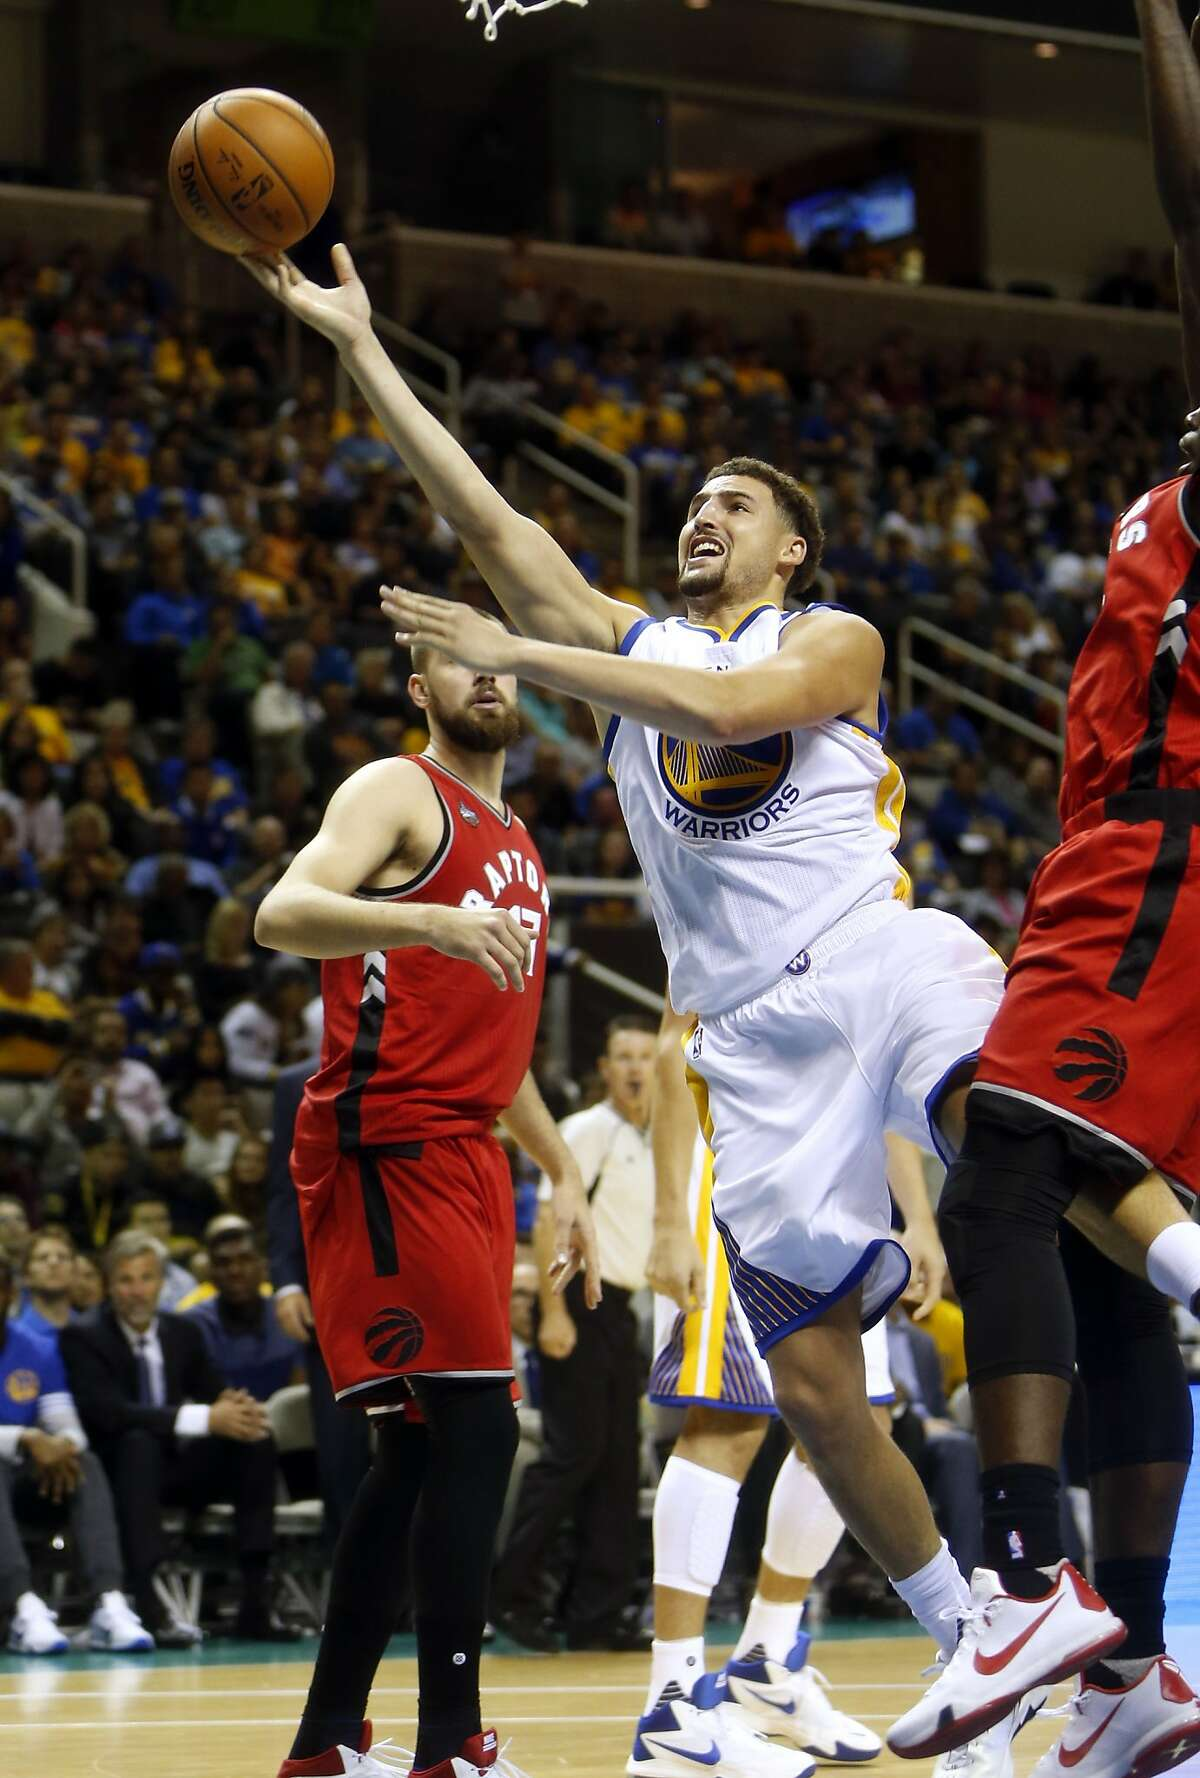 Golden State Warriors' Klay Thompson scores against Toronto Raptors in 1st quarter during NBA preseason game at SAP Center in San Jose, Calif., on Sunday, October 5, 2015.